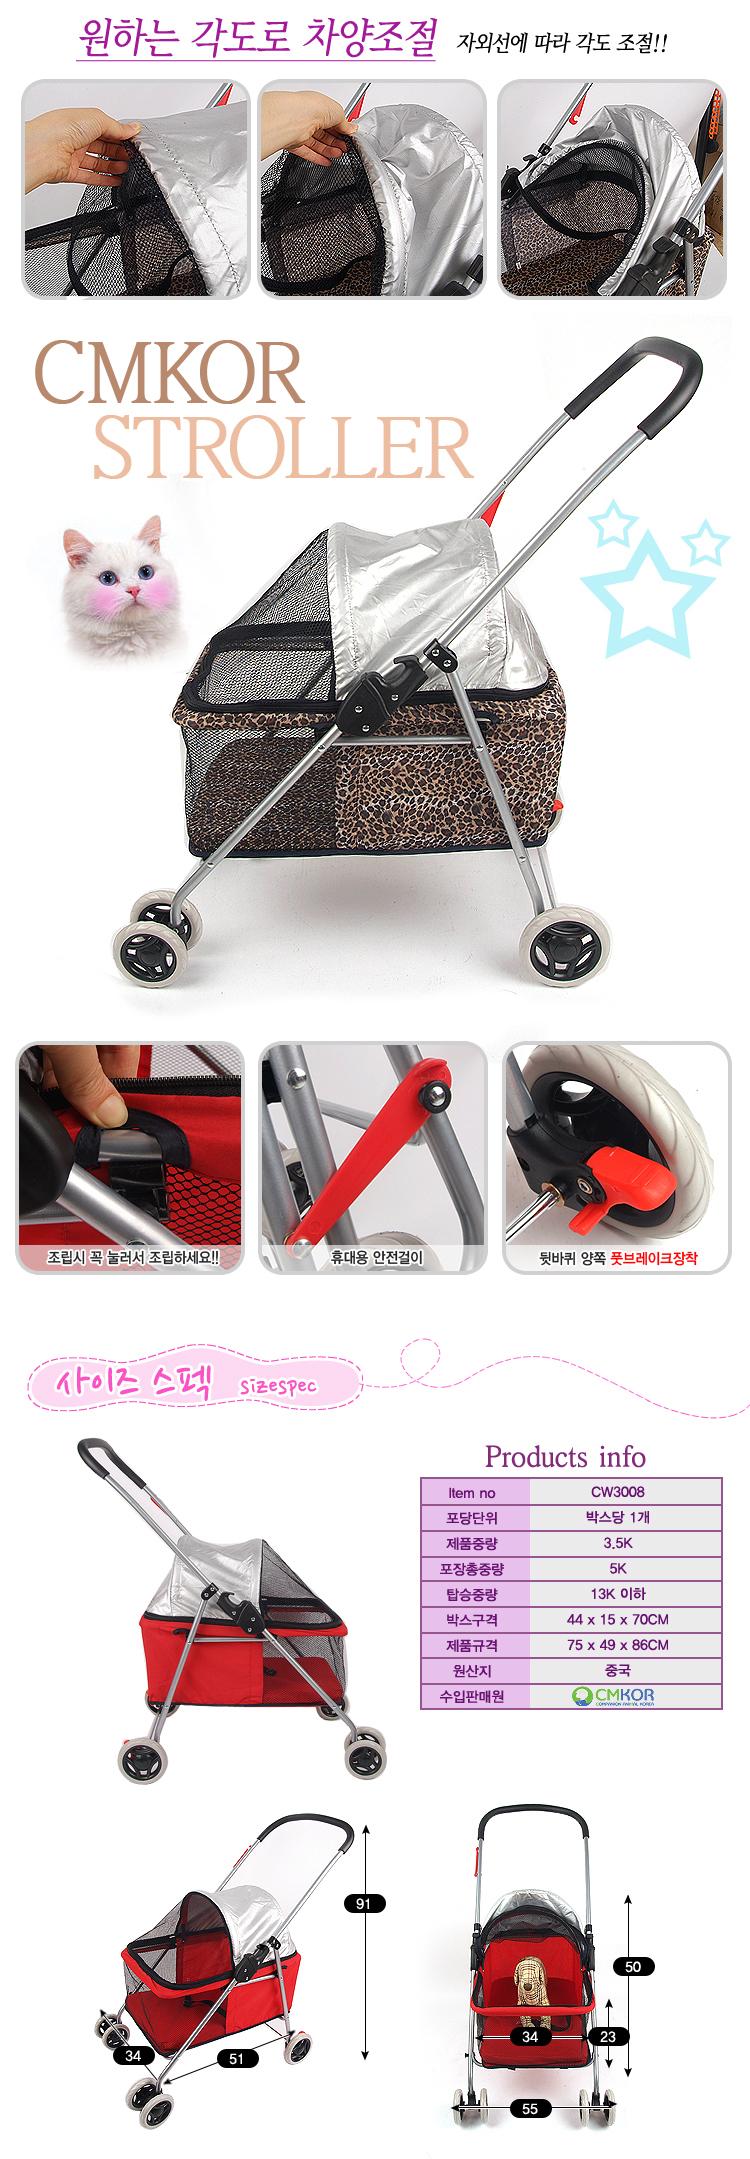 CM CW3008 반려동물 유모차 레드 - CMKOR, 77,000원, 이동장/리드줄/야외용품, 유모차